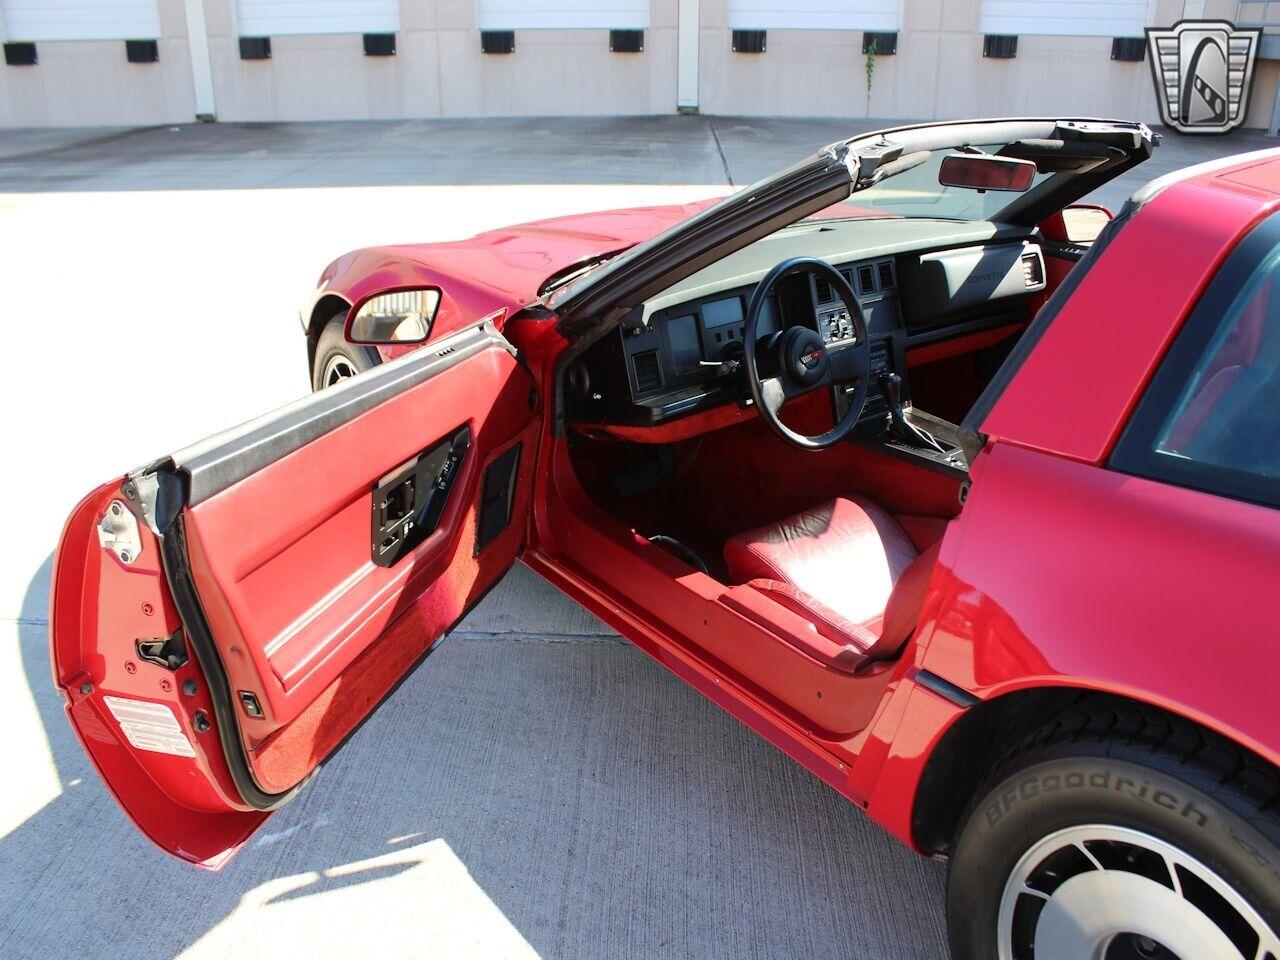 1984 Red Chevrolet Corvette     C4 Corvette Photo 7